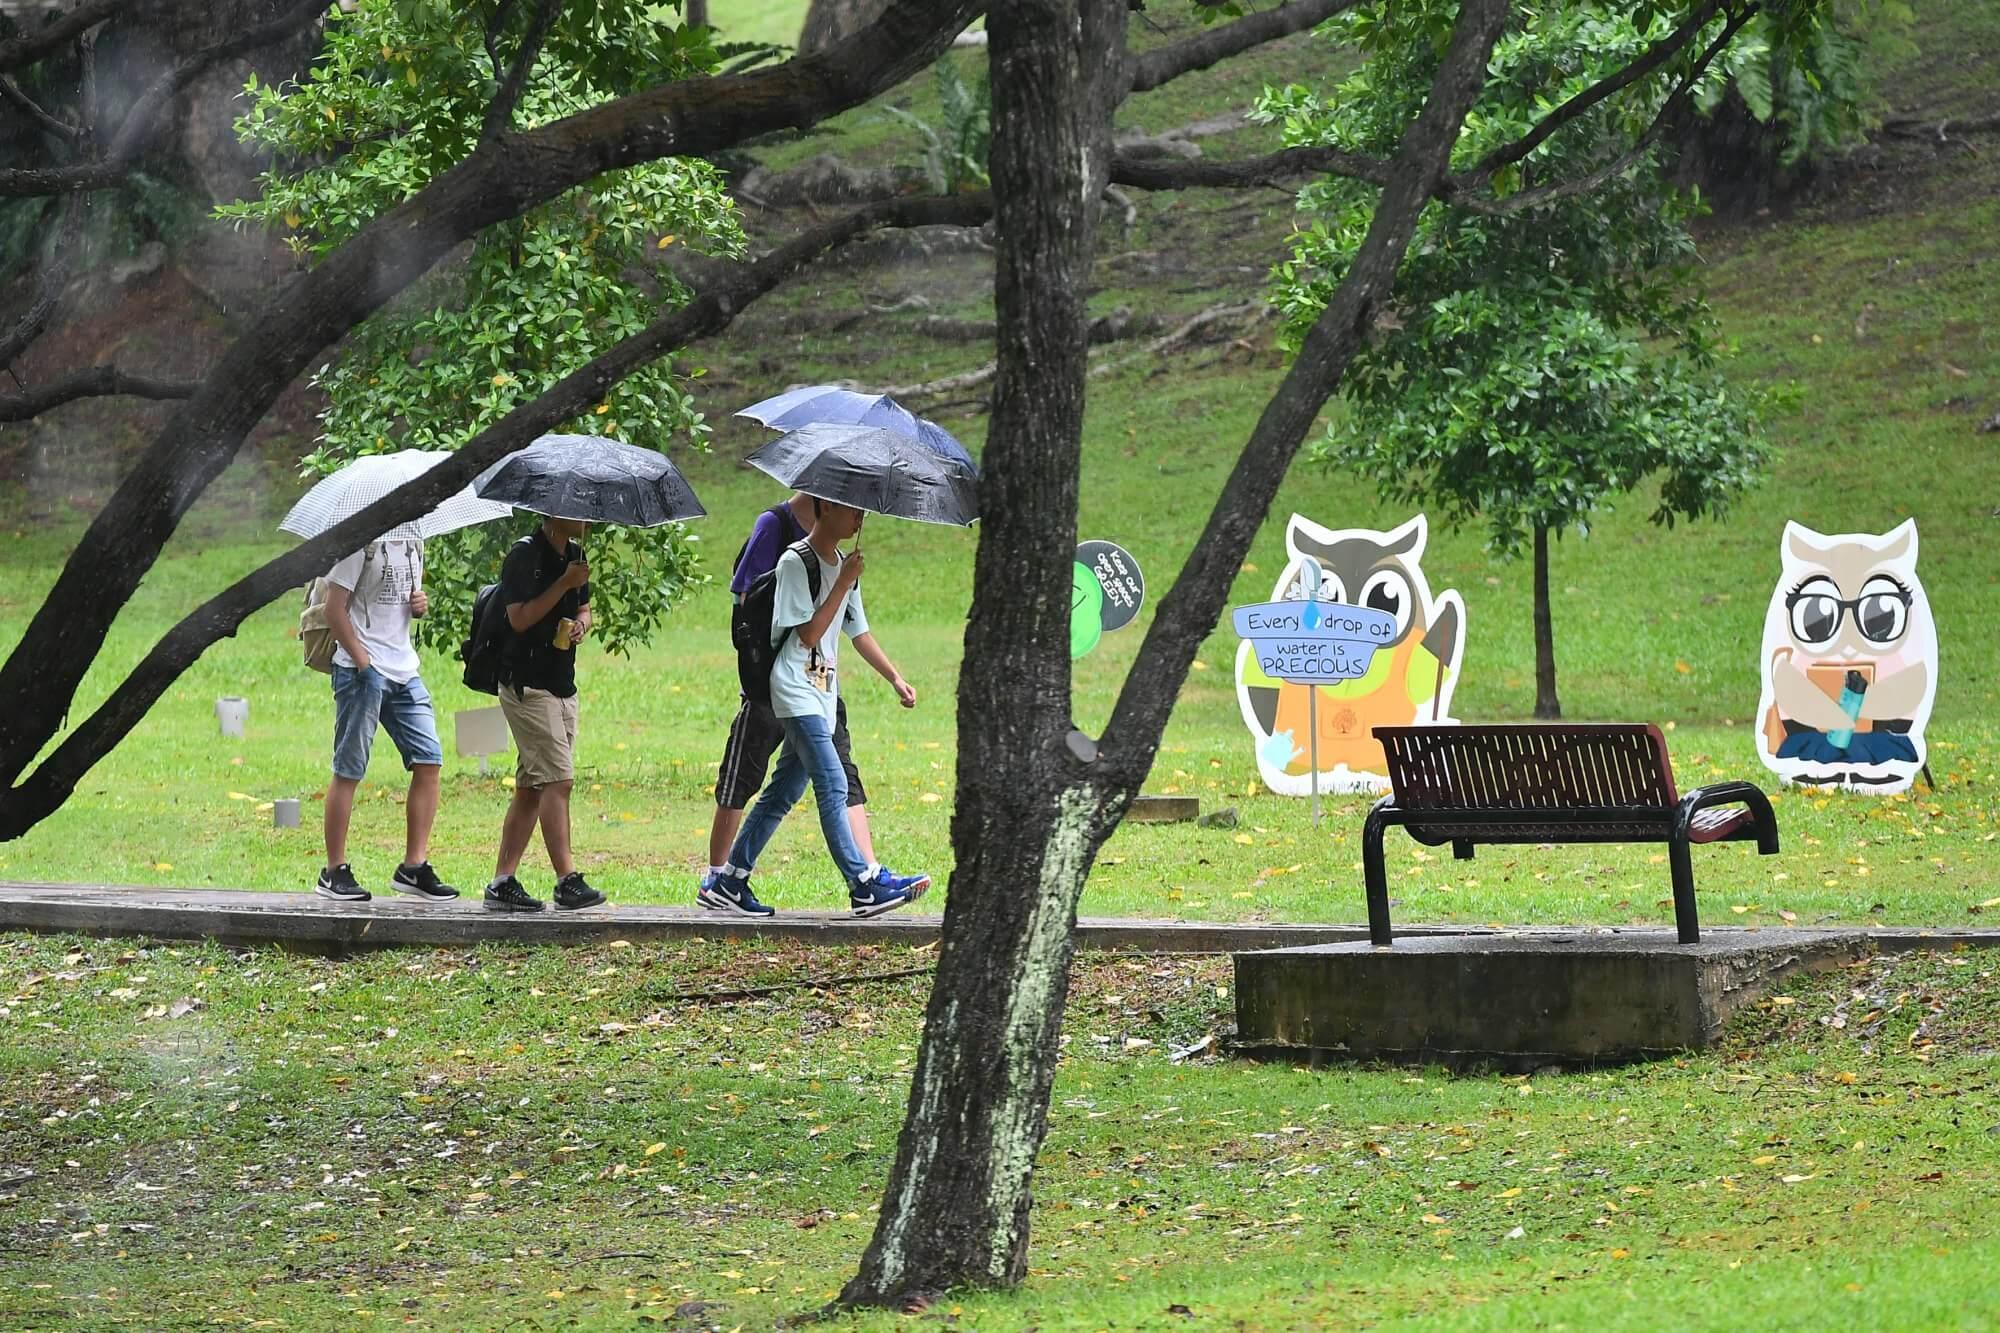 people carrying umbrella in rain